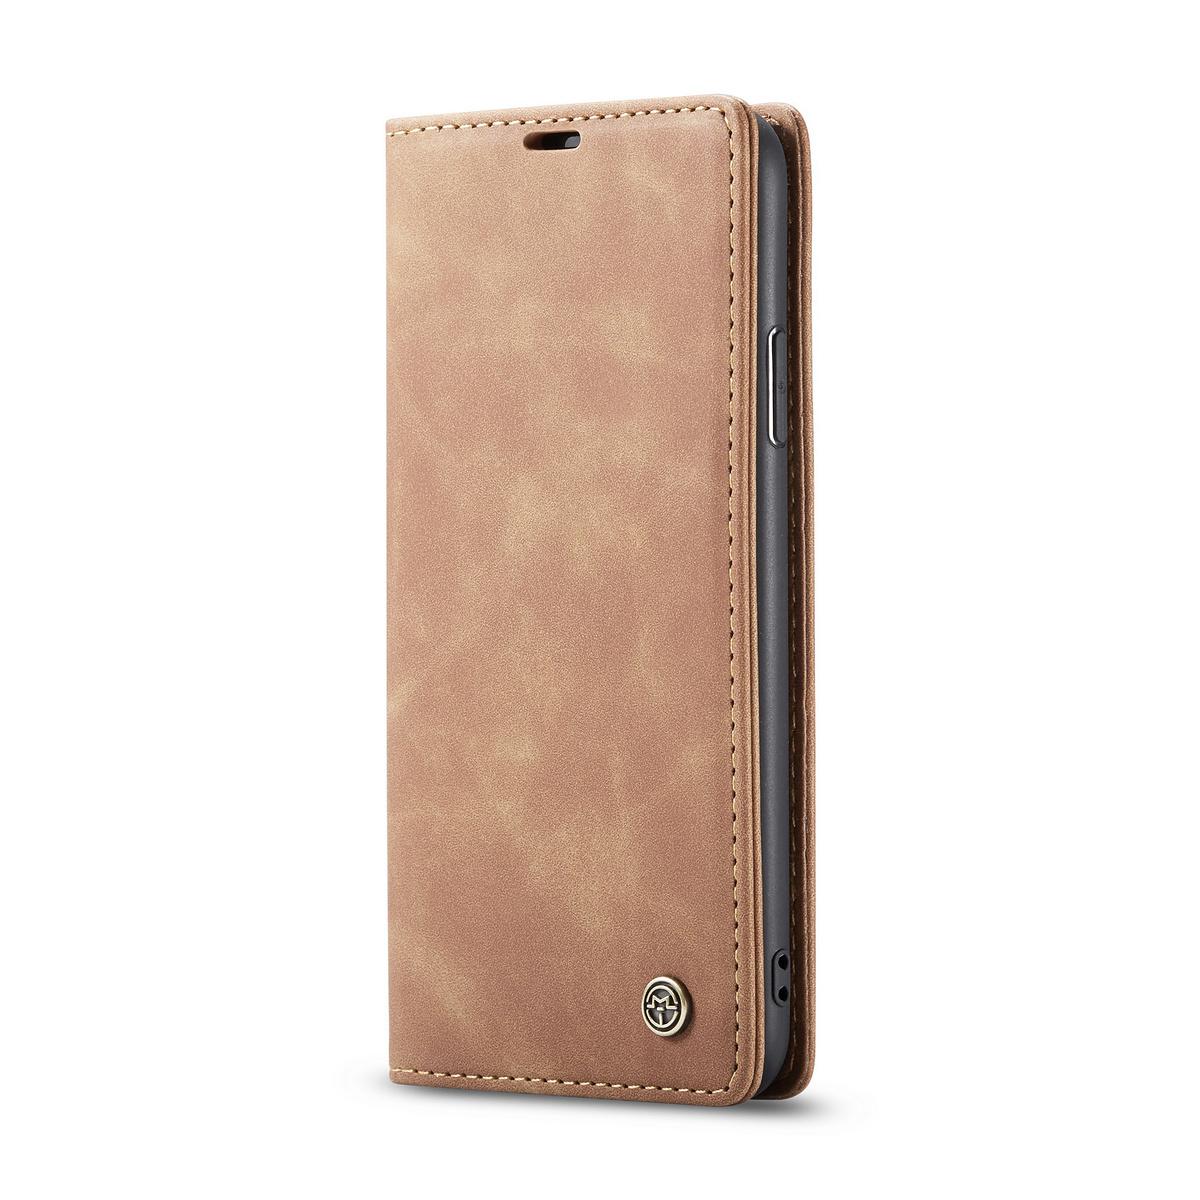 CaseMe plånboksfodral, iPhone 11 Pro Max, brun